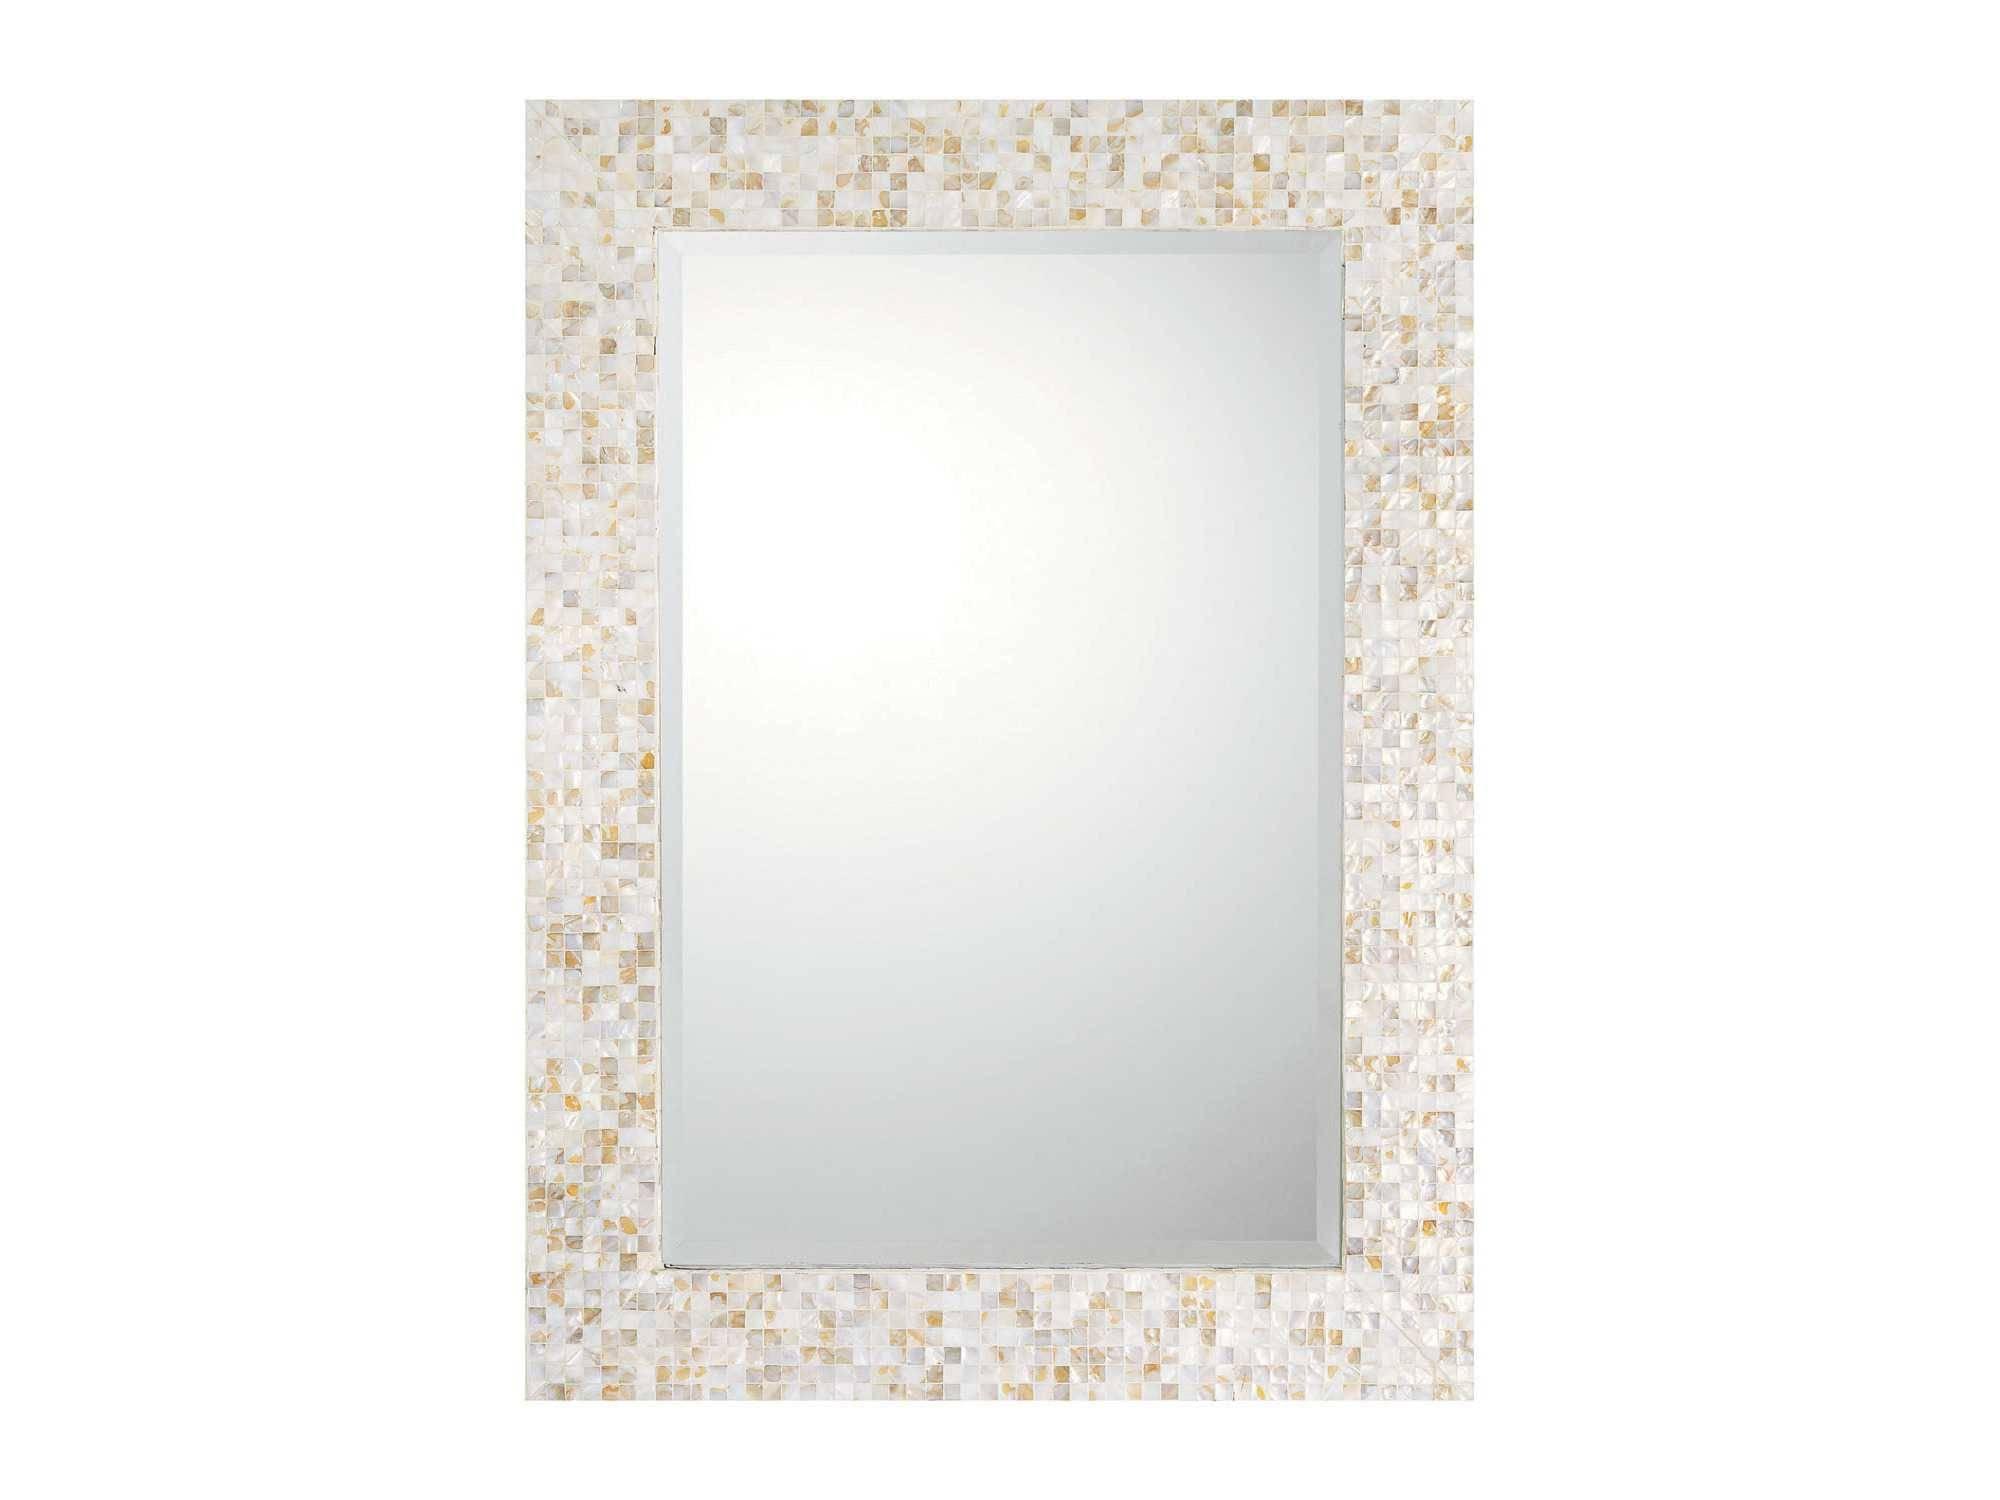 Capital Lighting 32 X 44 Rectangular Beveled Mother Of Pearl Wall For Mother Of Pearl Wall Mirrors (View 4 of 15)